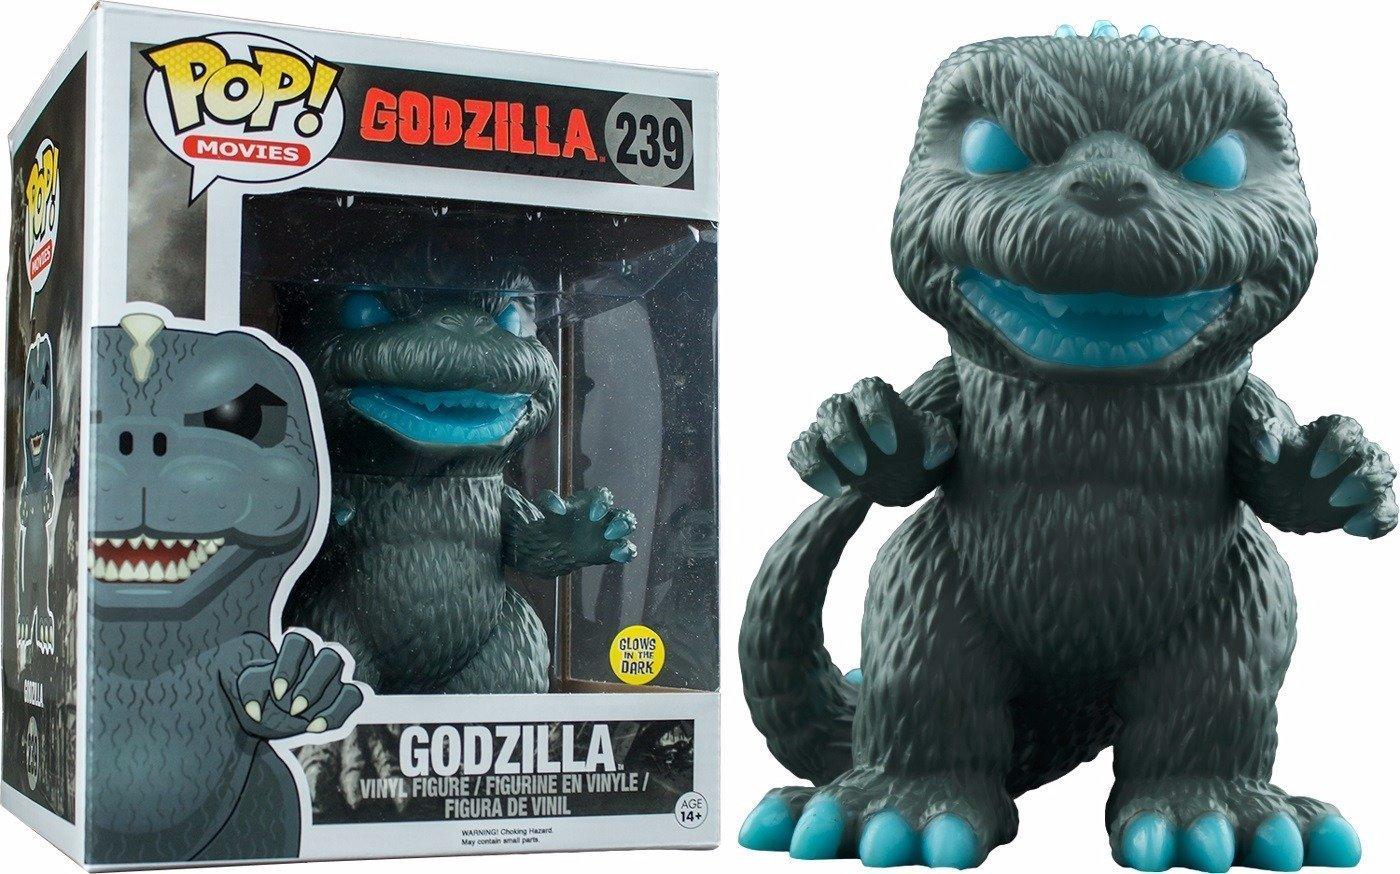 Godzilla Godzilla Atomic Oversized Funko Pop Vinyl